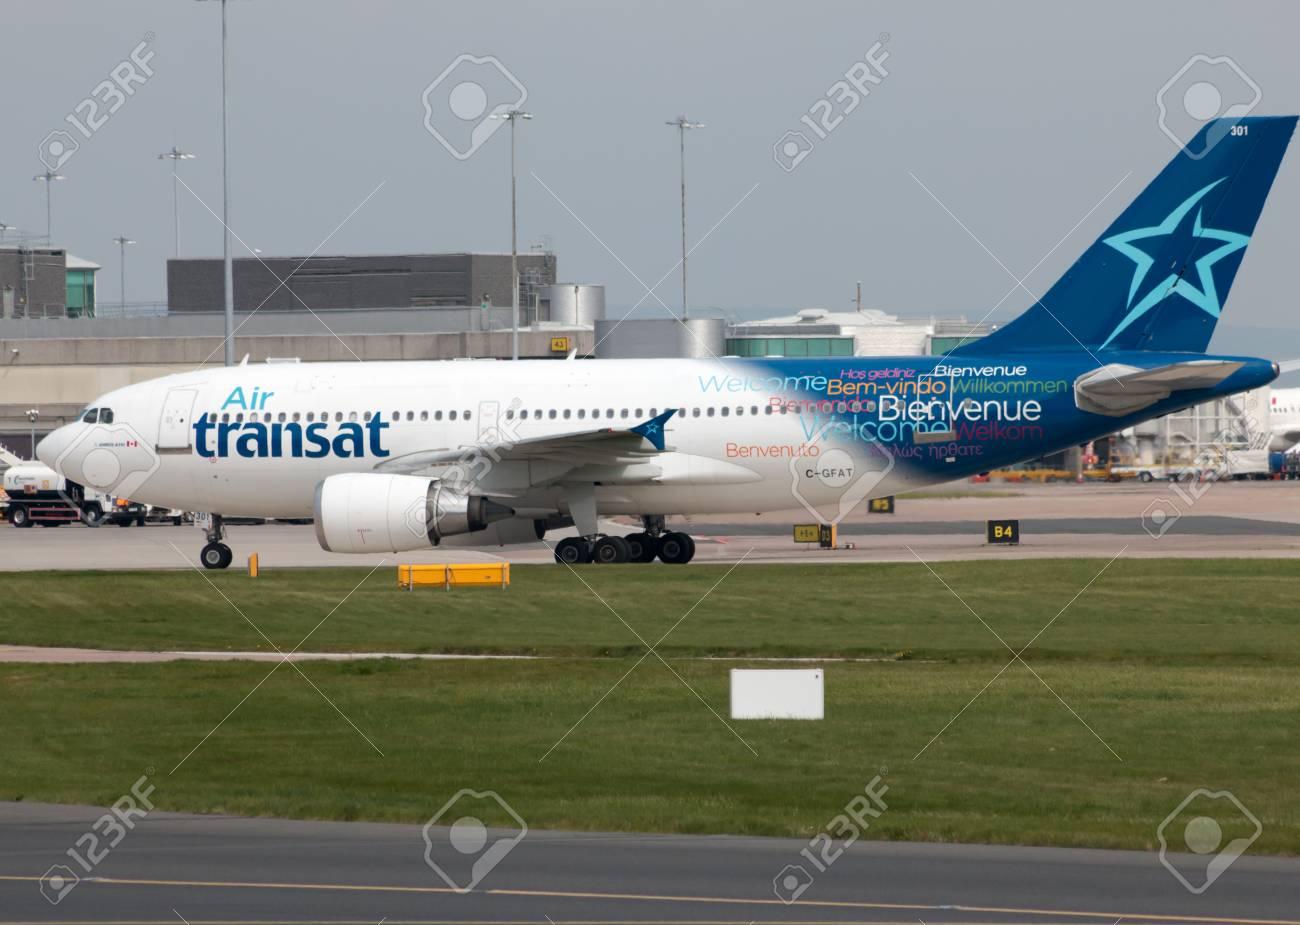 air transat airbus a310 wide body passenger plane c gfat taxiing rh 123rf com Airbus A310 A310 Aircraft Body